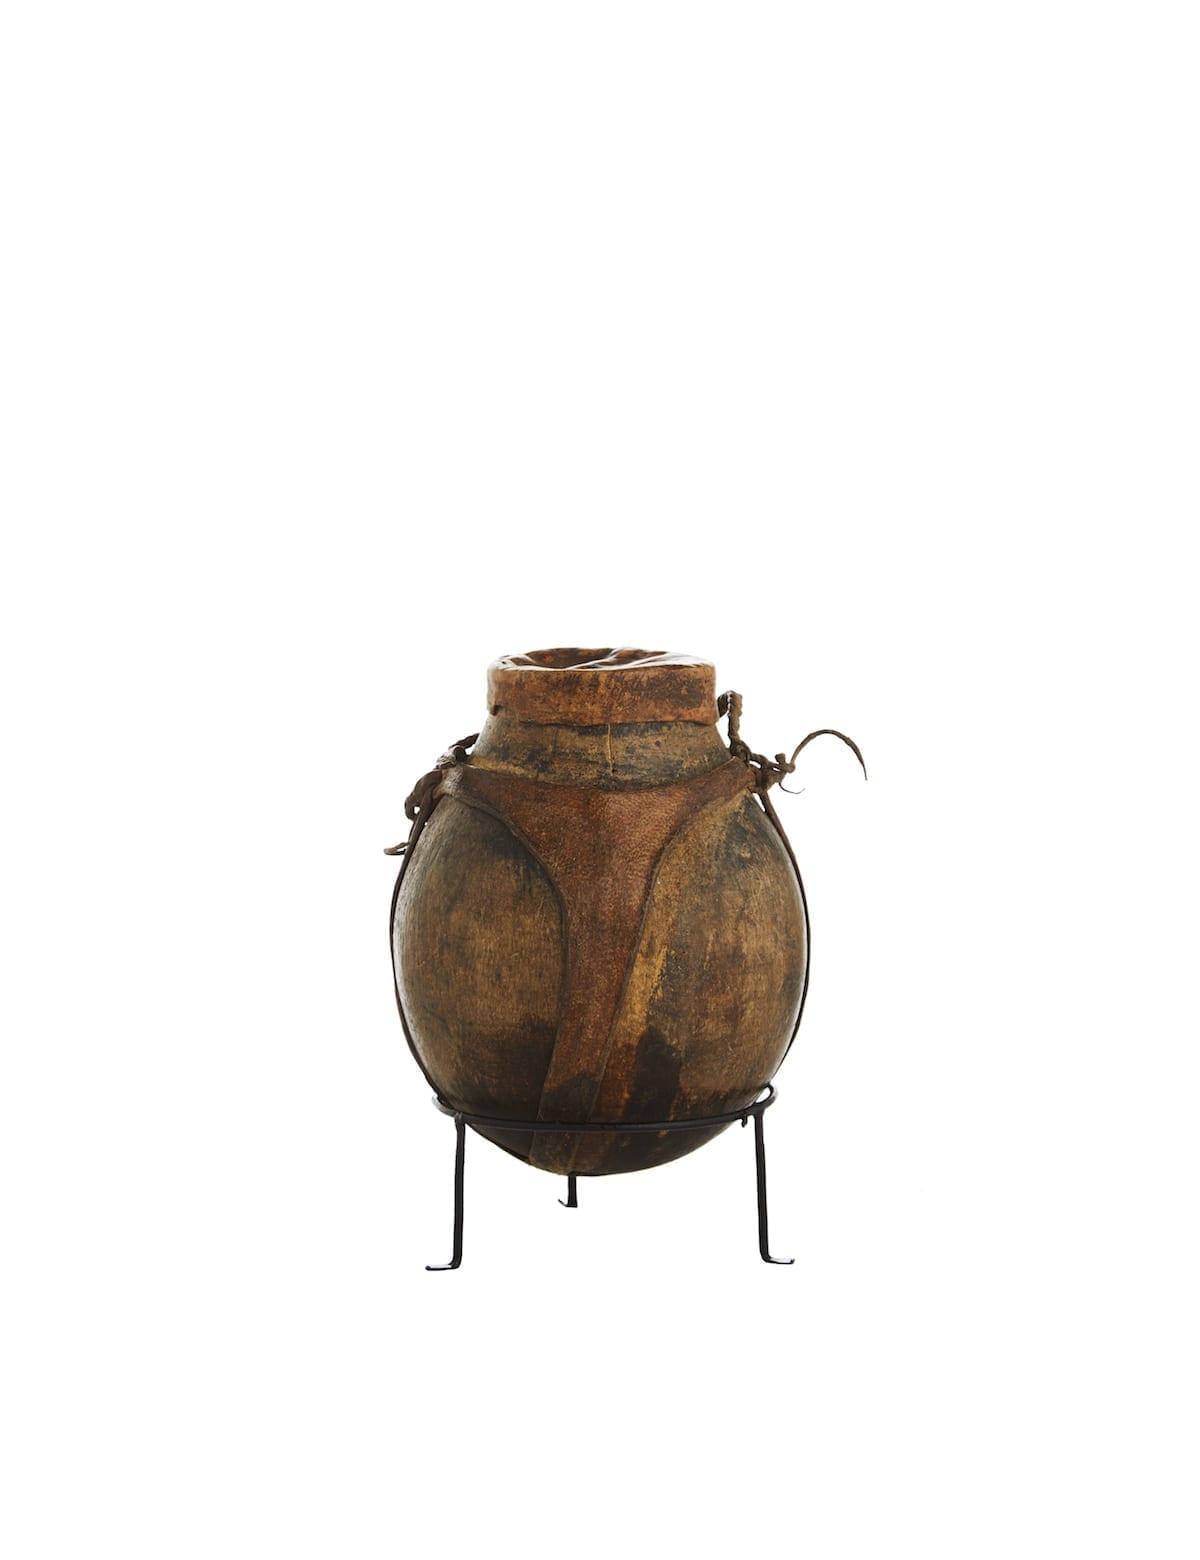 Turkana water container